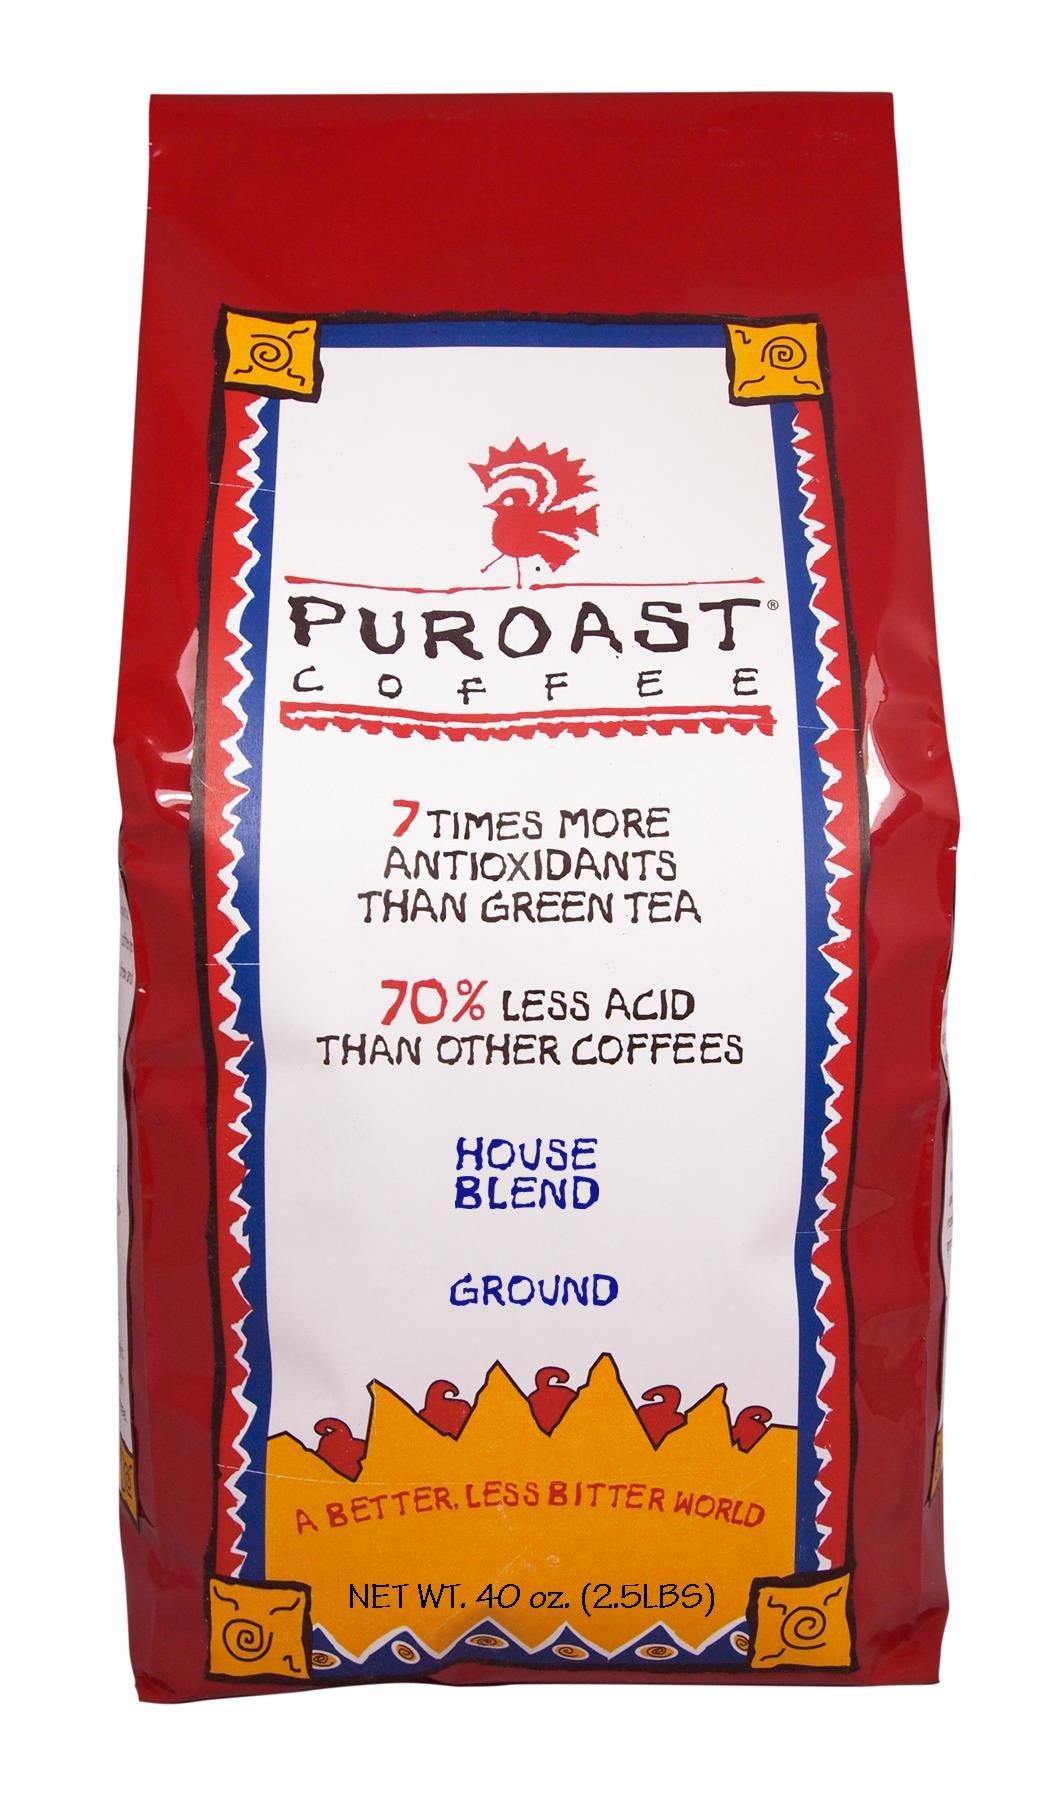 Puroast Low Acid Coffee House Blend Drip Grind, 2.5-Pound Bag by Puroast Coffee